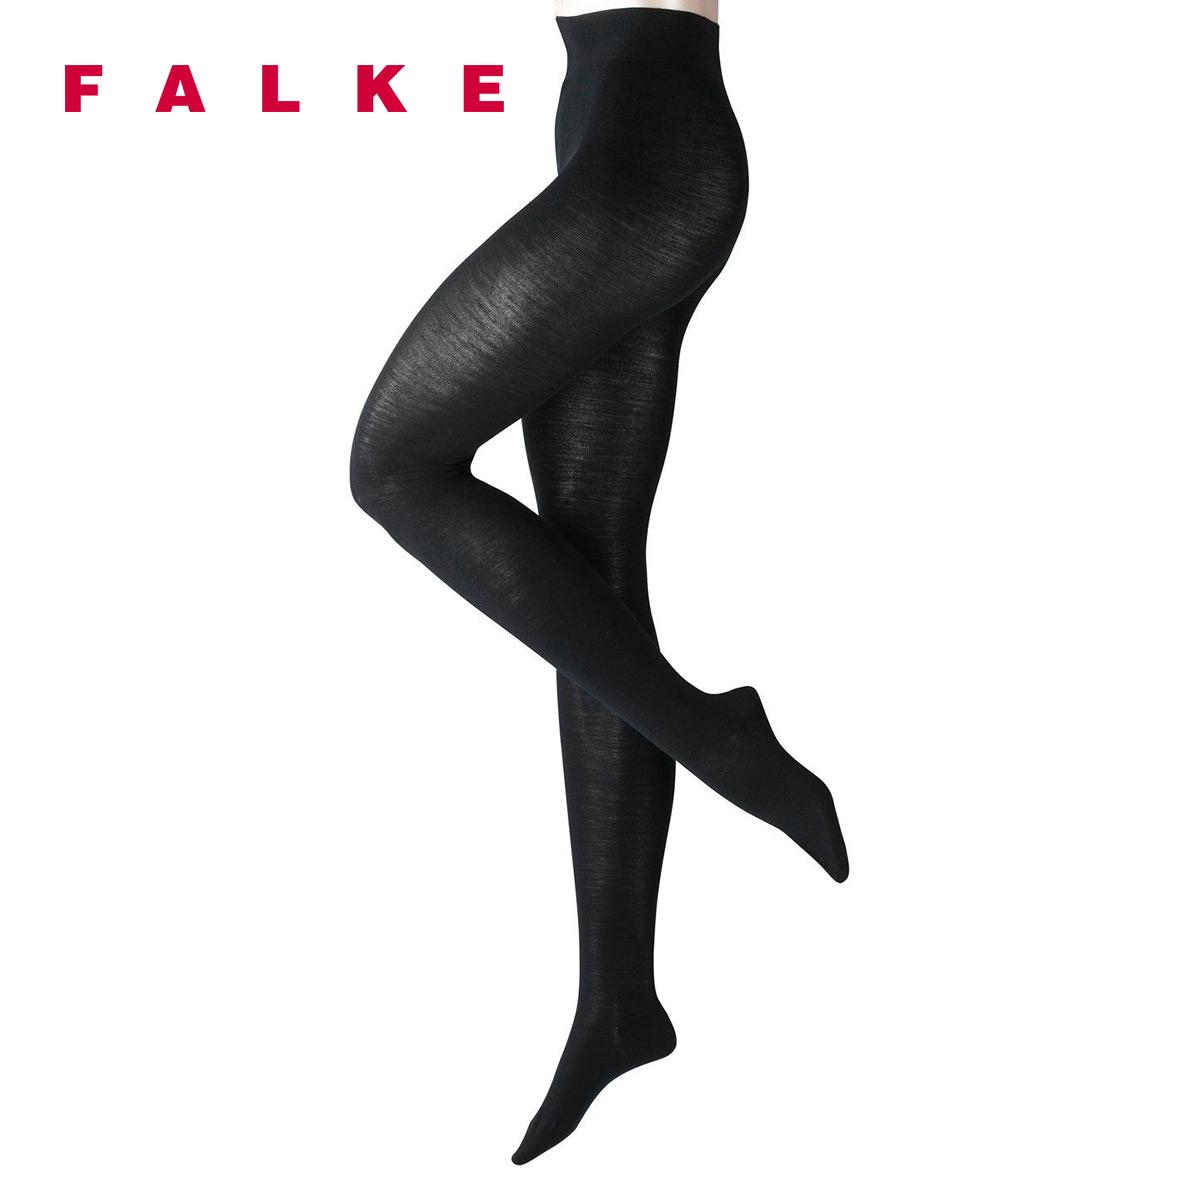 FALKE春夏季德国进口连裤袜Softmerino保暖肉色打底裤袜女48425